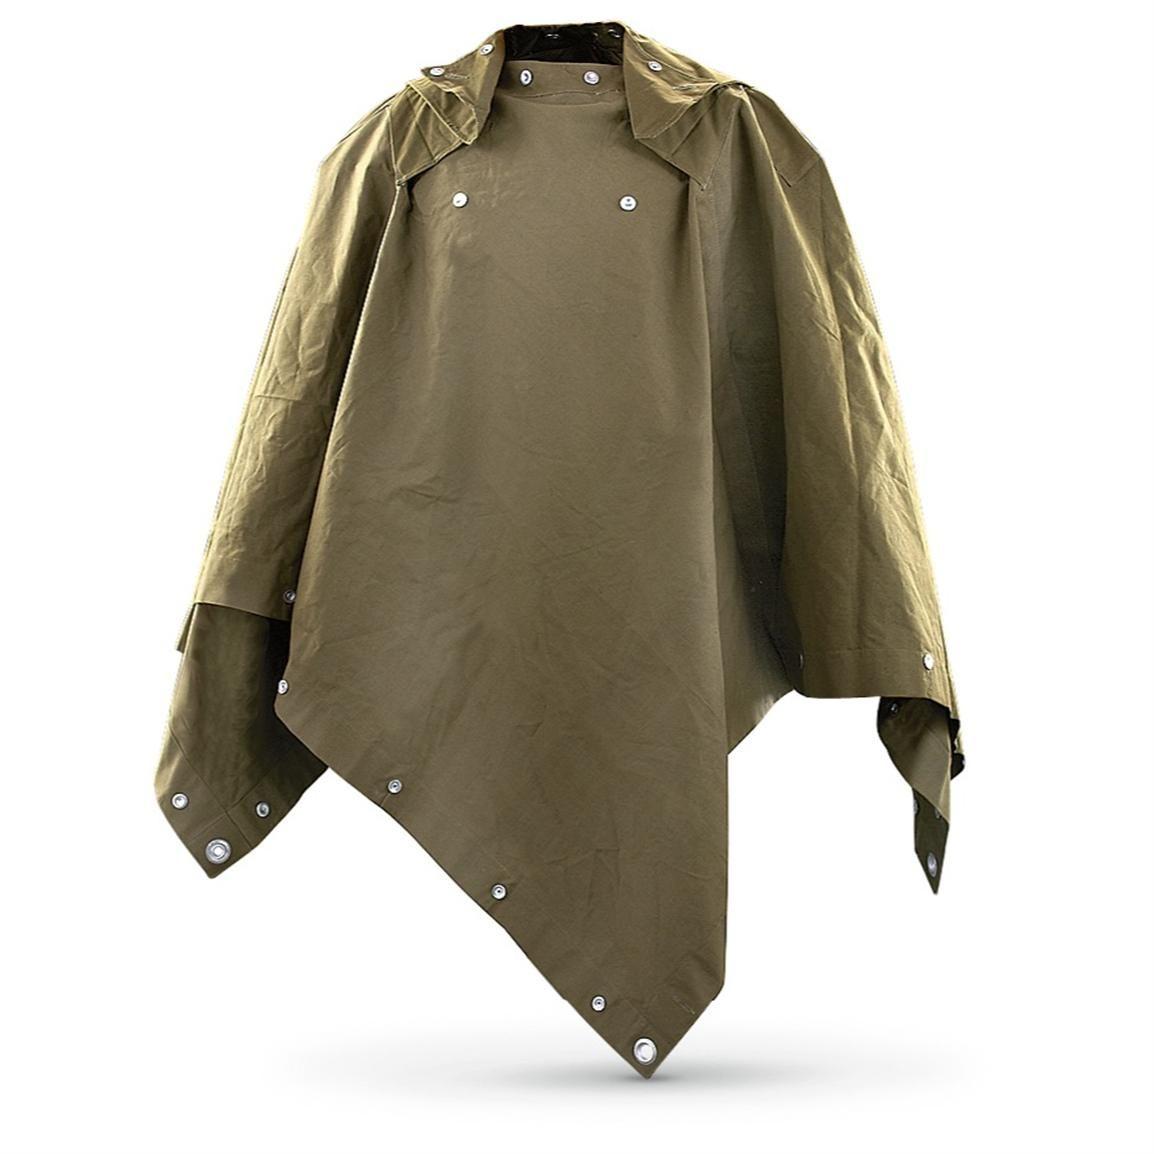 1fbde3fa04c22 2 Used Dutch Military Shelter / Ponchos, Olive Drab | Uniformity ...